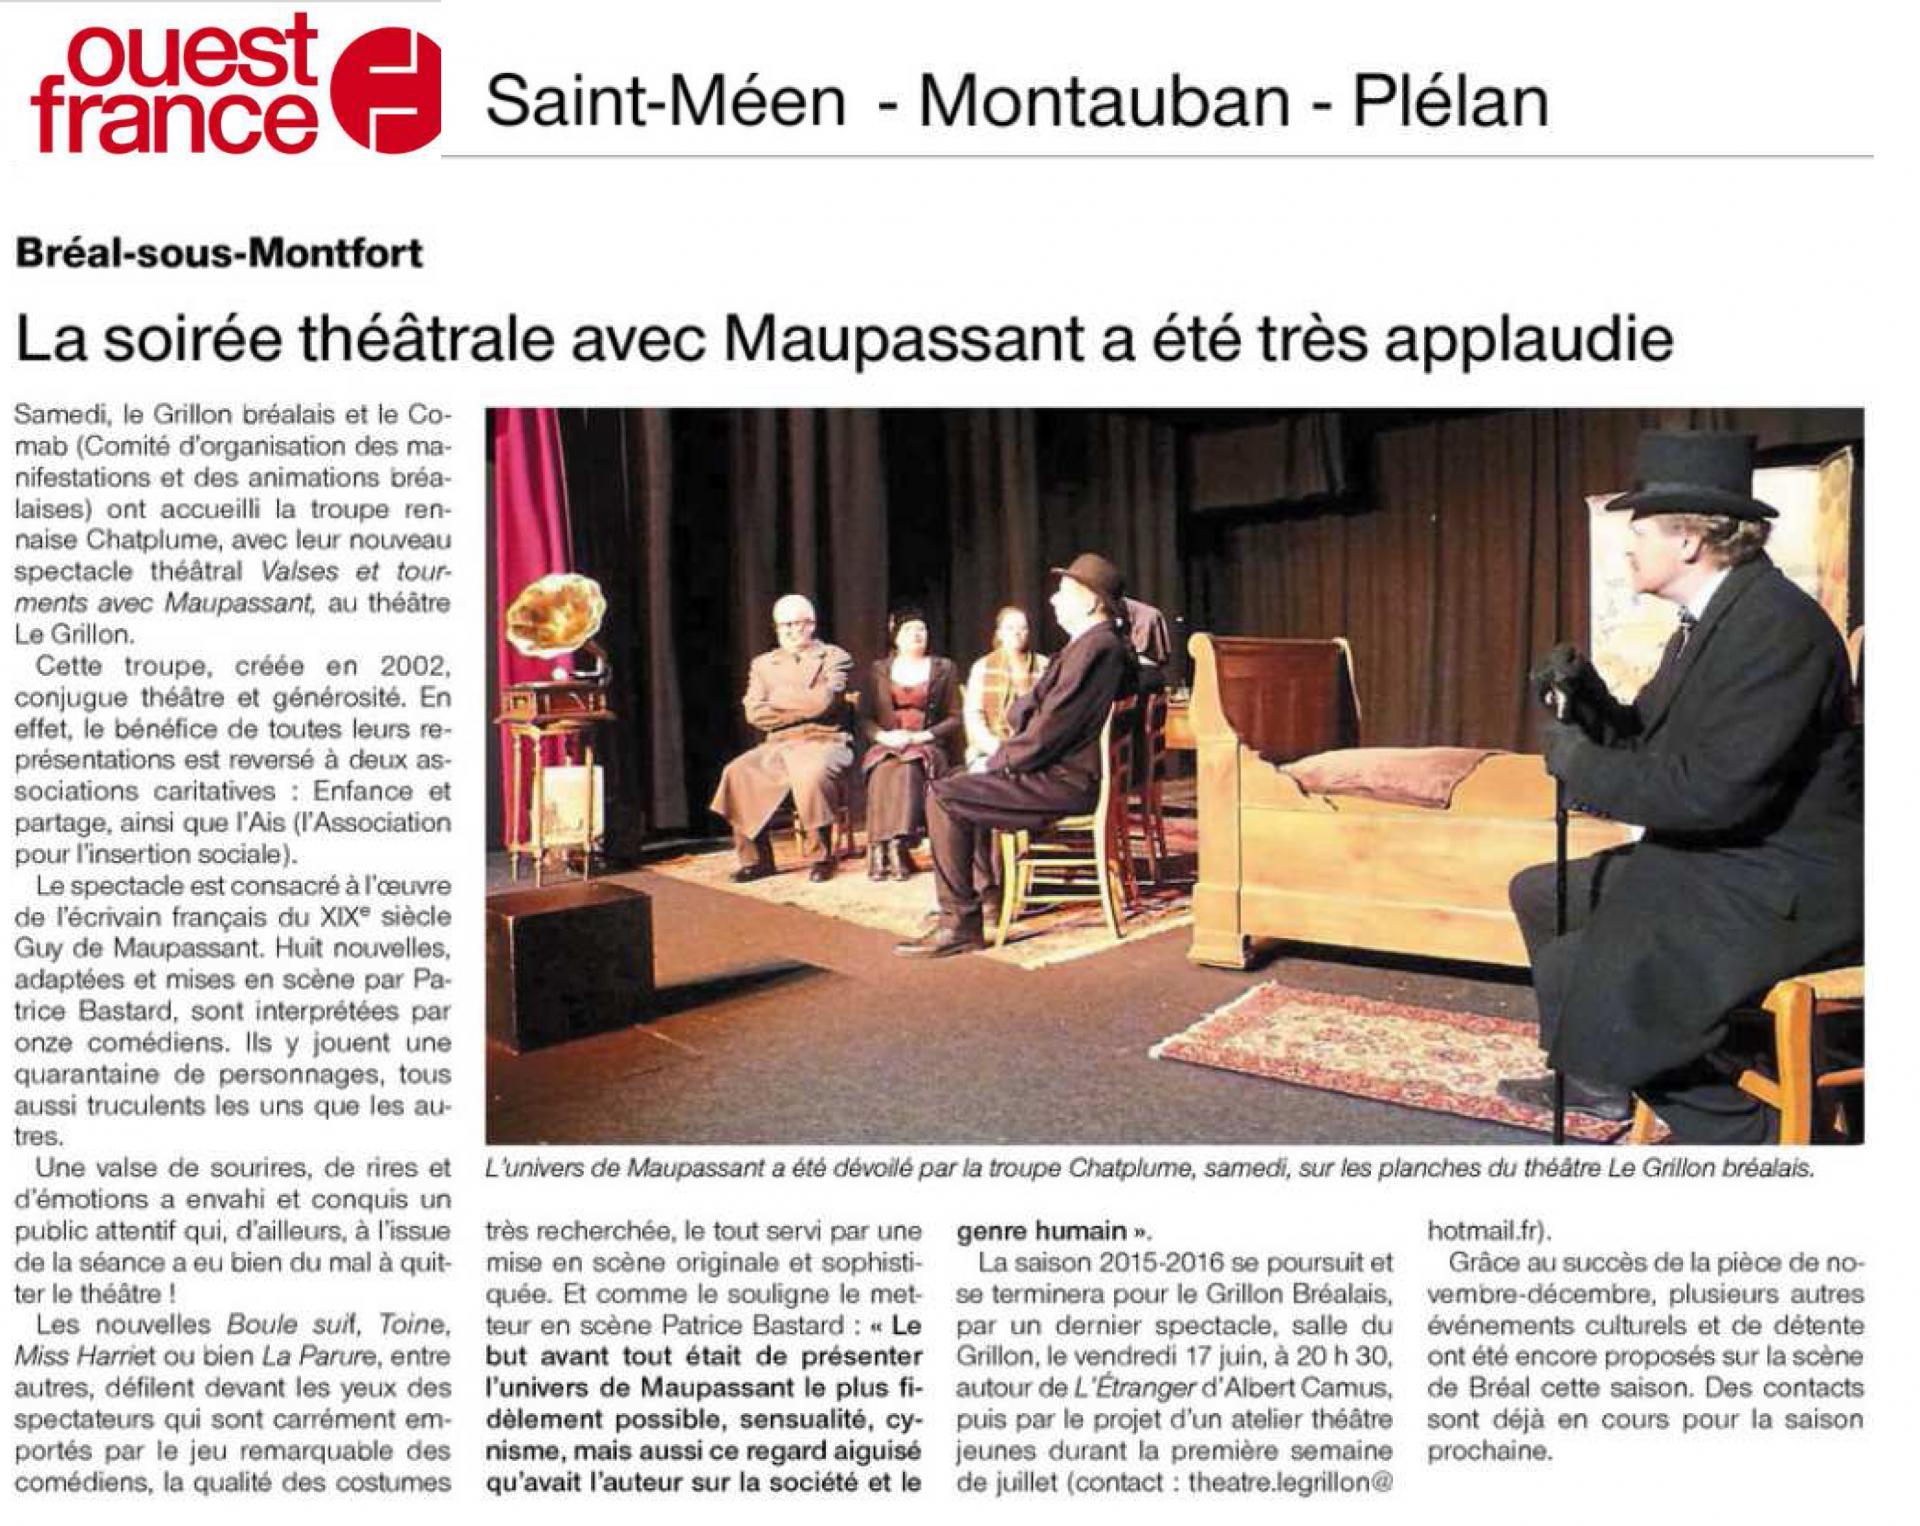 Revue de presse of 27 04 16